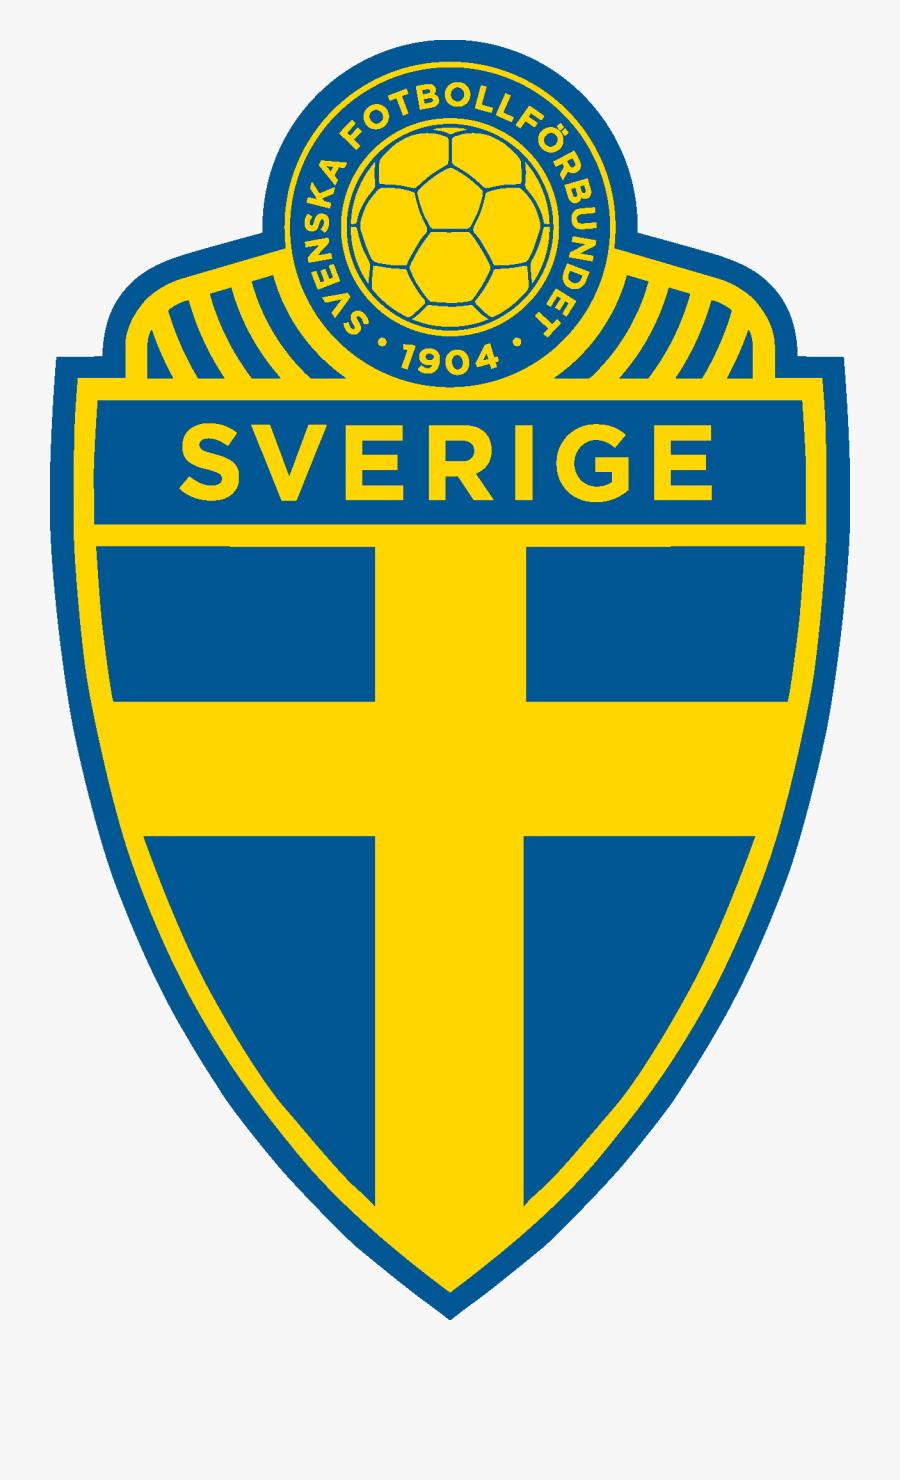 Swedish Football Association Amp Sweden National Football - Sweden National Football Team Logo, Transparent Clipart